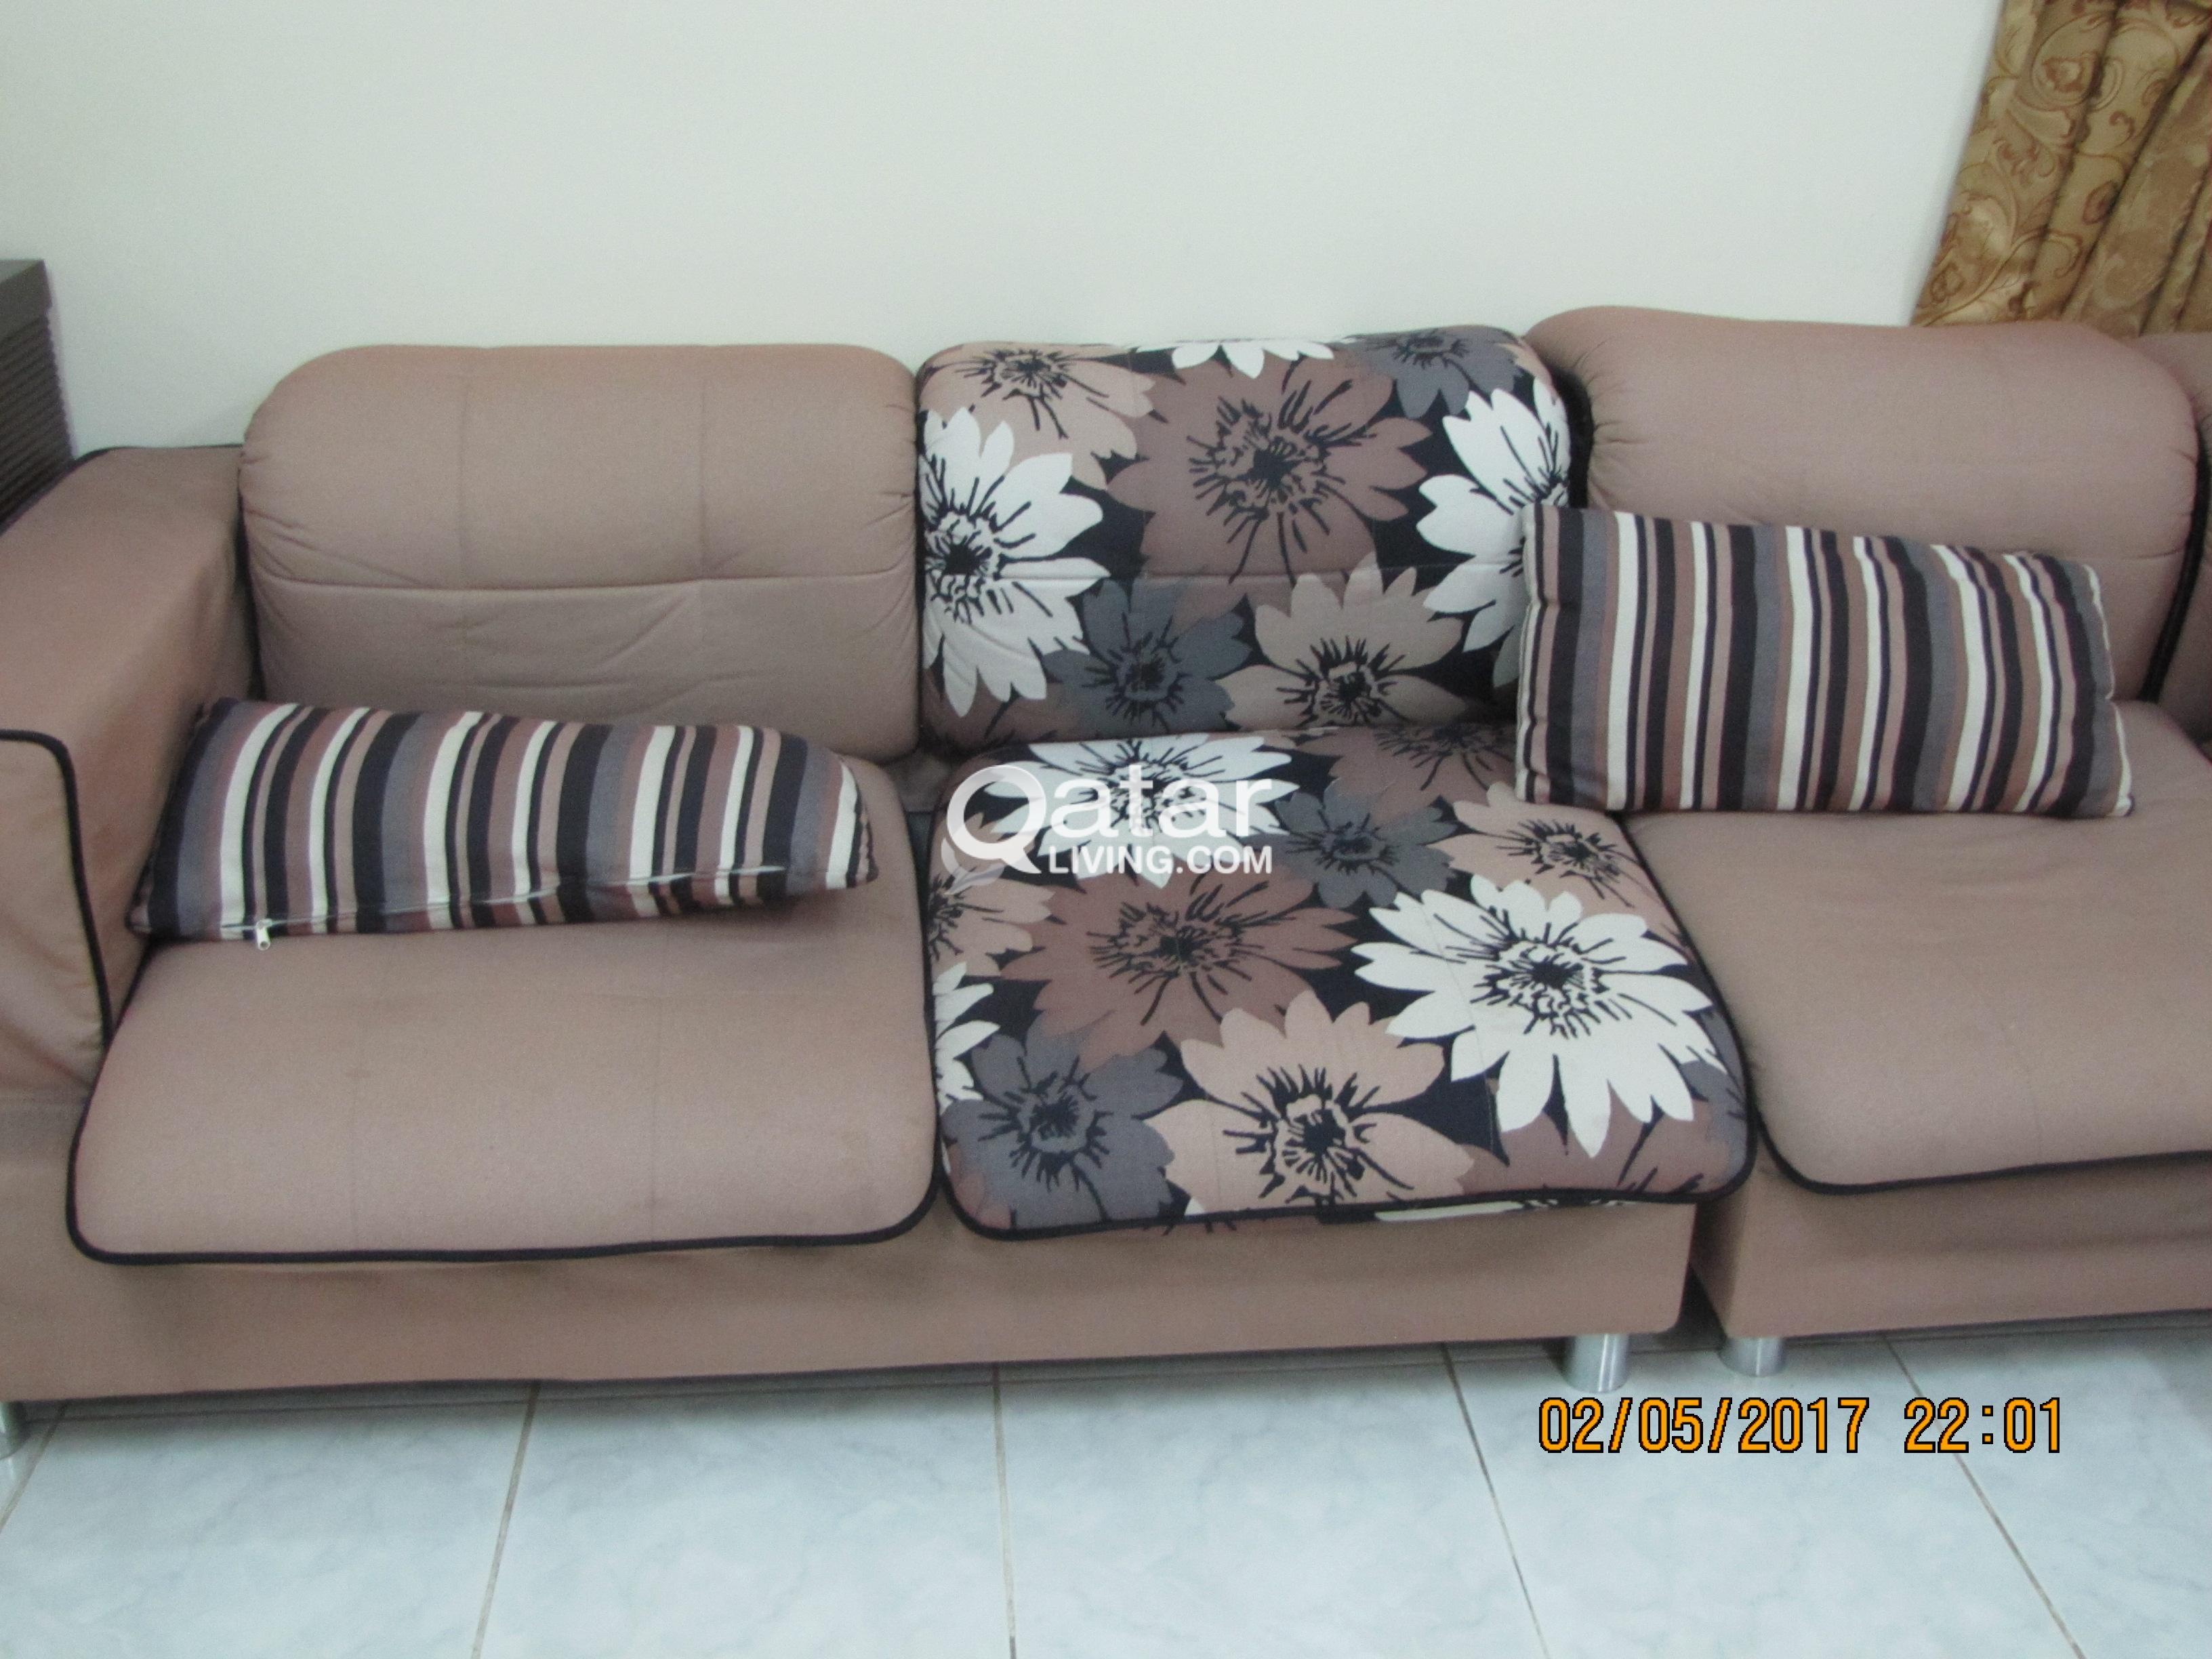 online sofa set in dubai charity pick up used home kathmandu thesofa